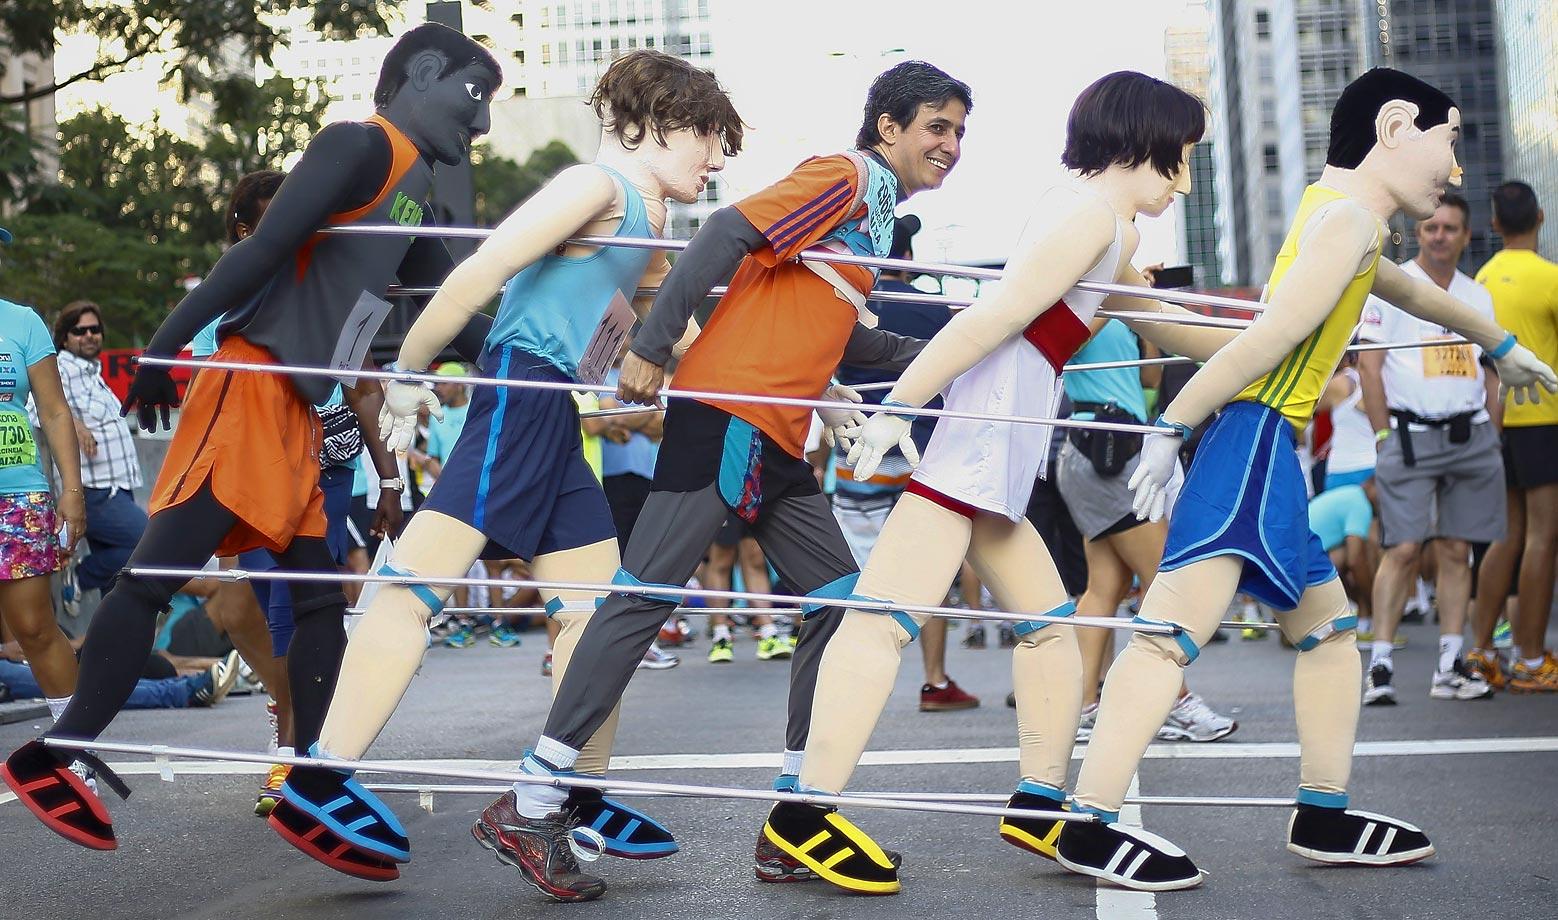 The 90th Sao Silvestre international 15 km race in Sao Paulo, Brazil.